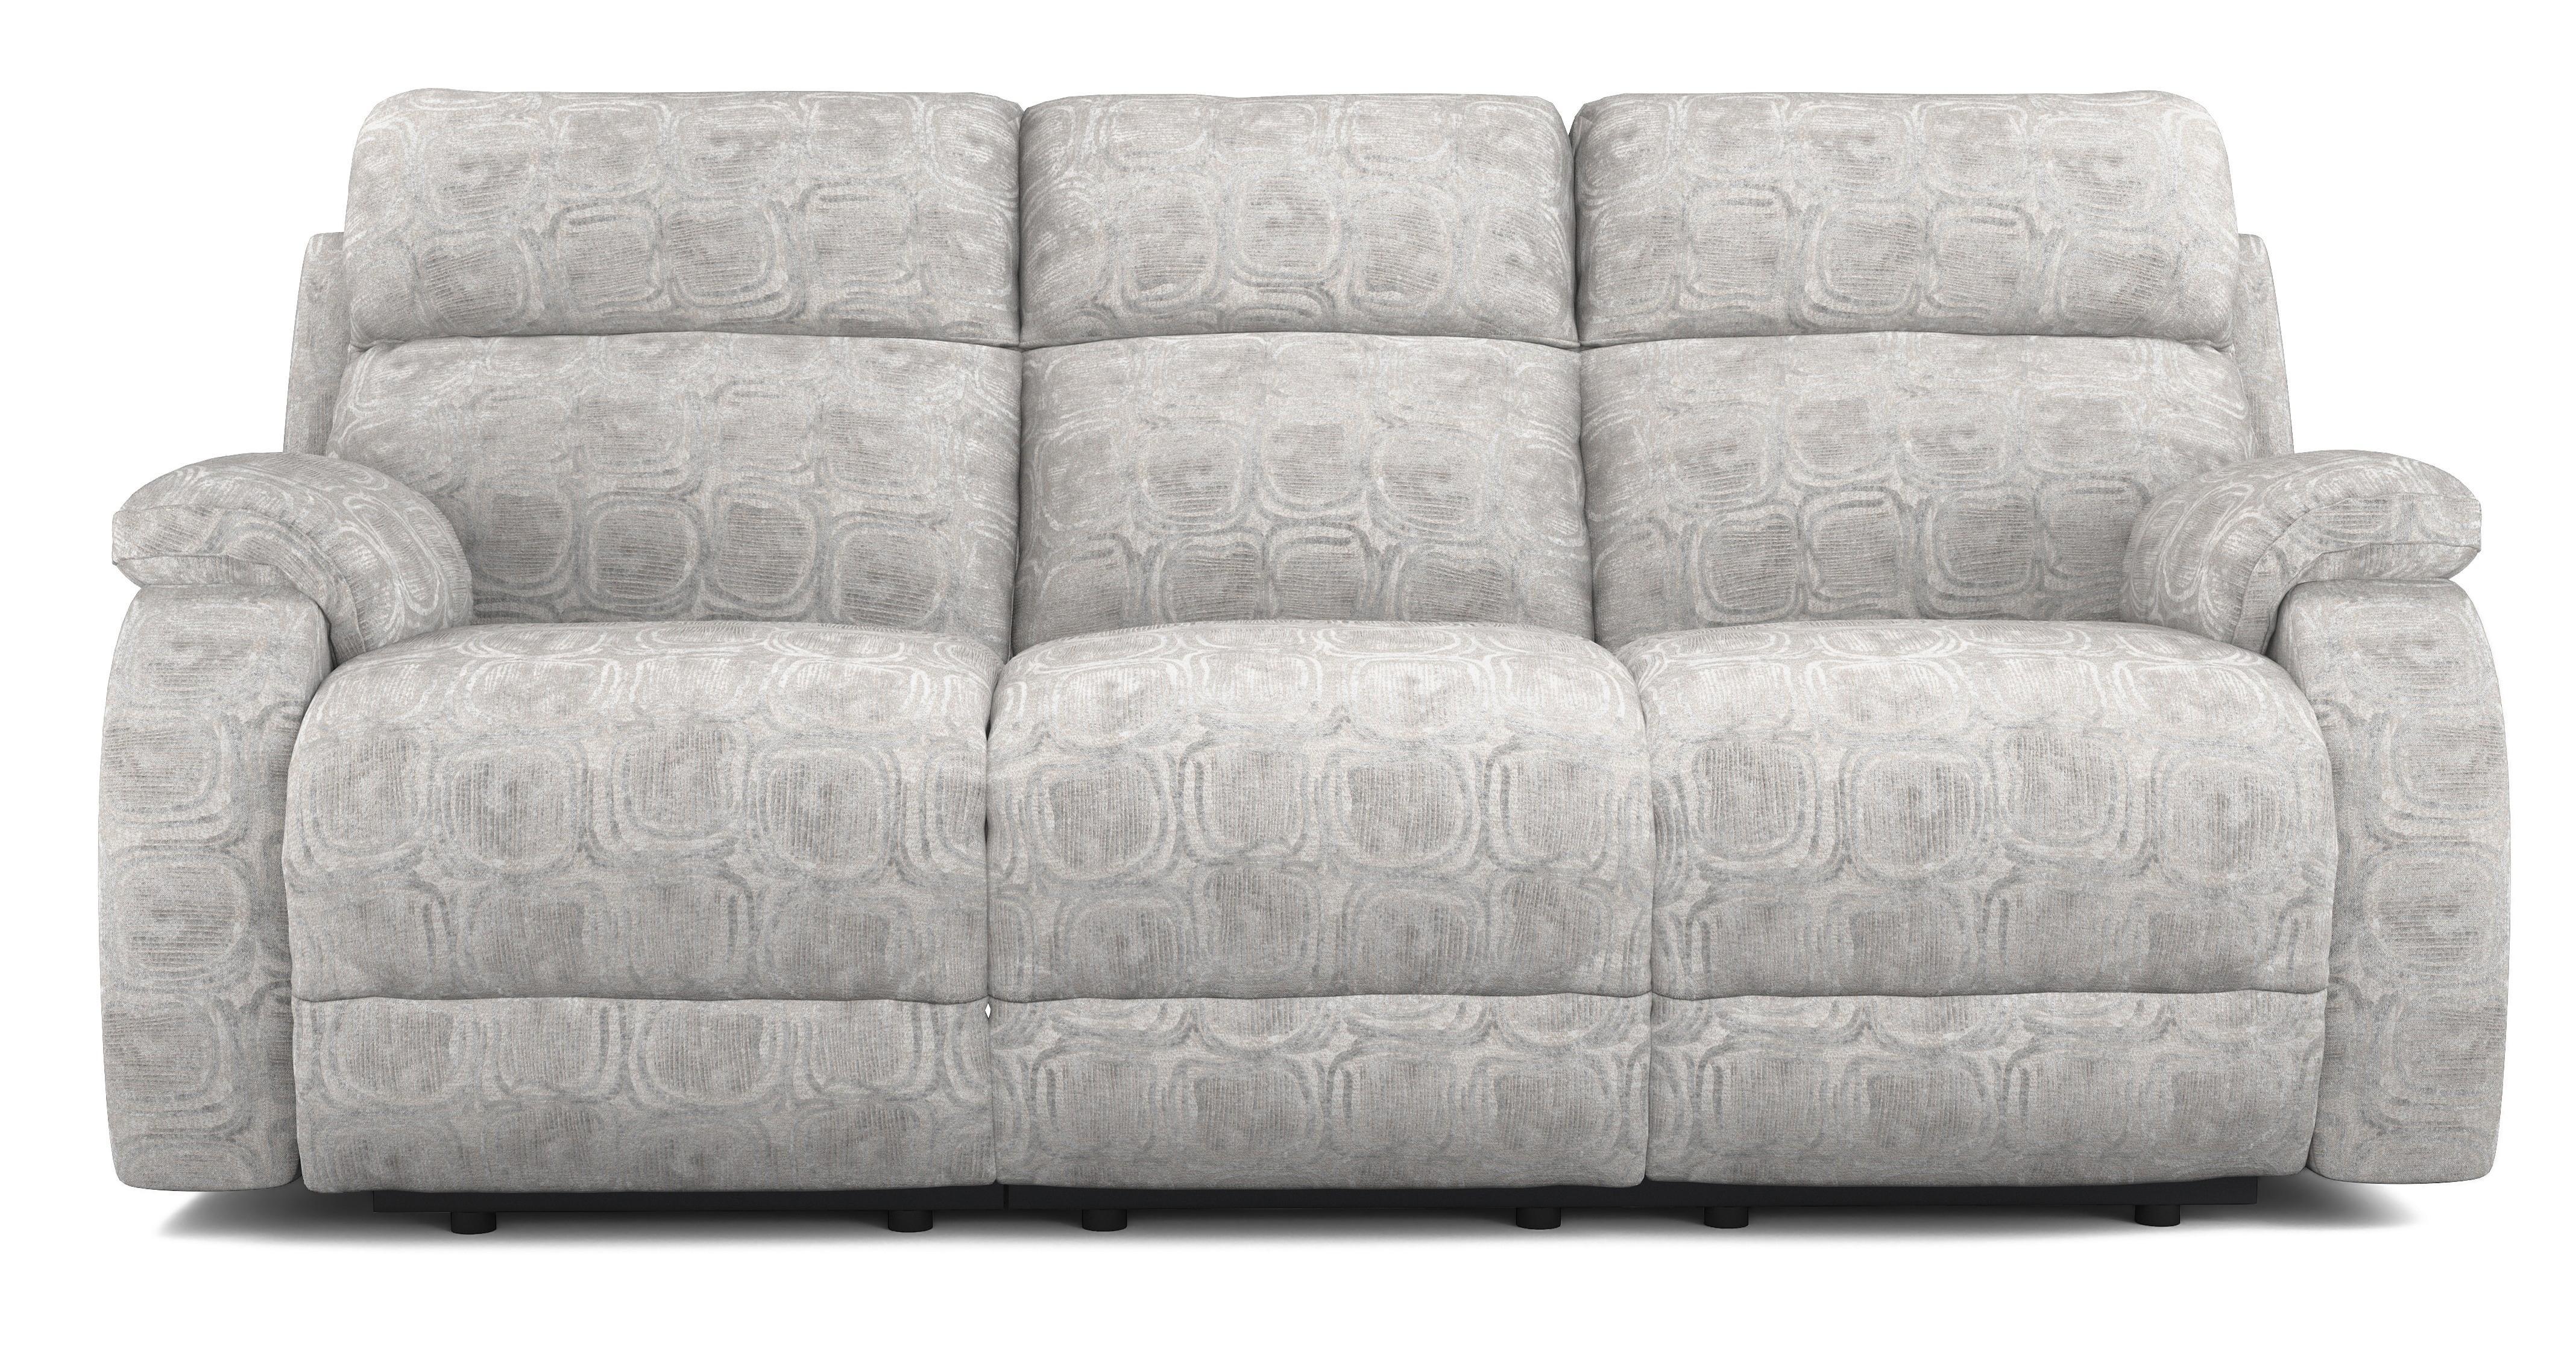 vine dfs sofa review florence chenille fabric vinyl with nailhead trim newbury gradschoolfairs